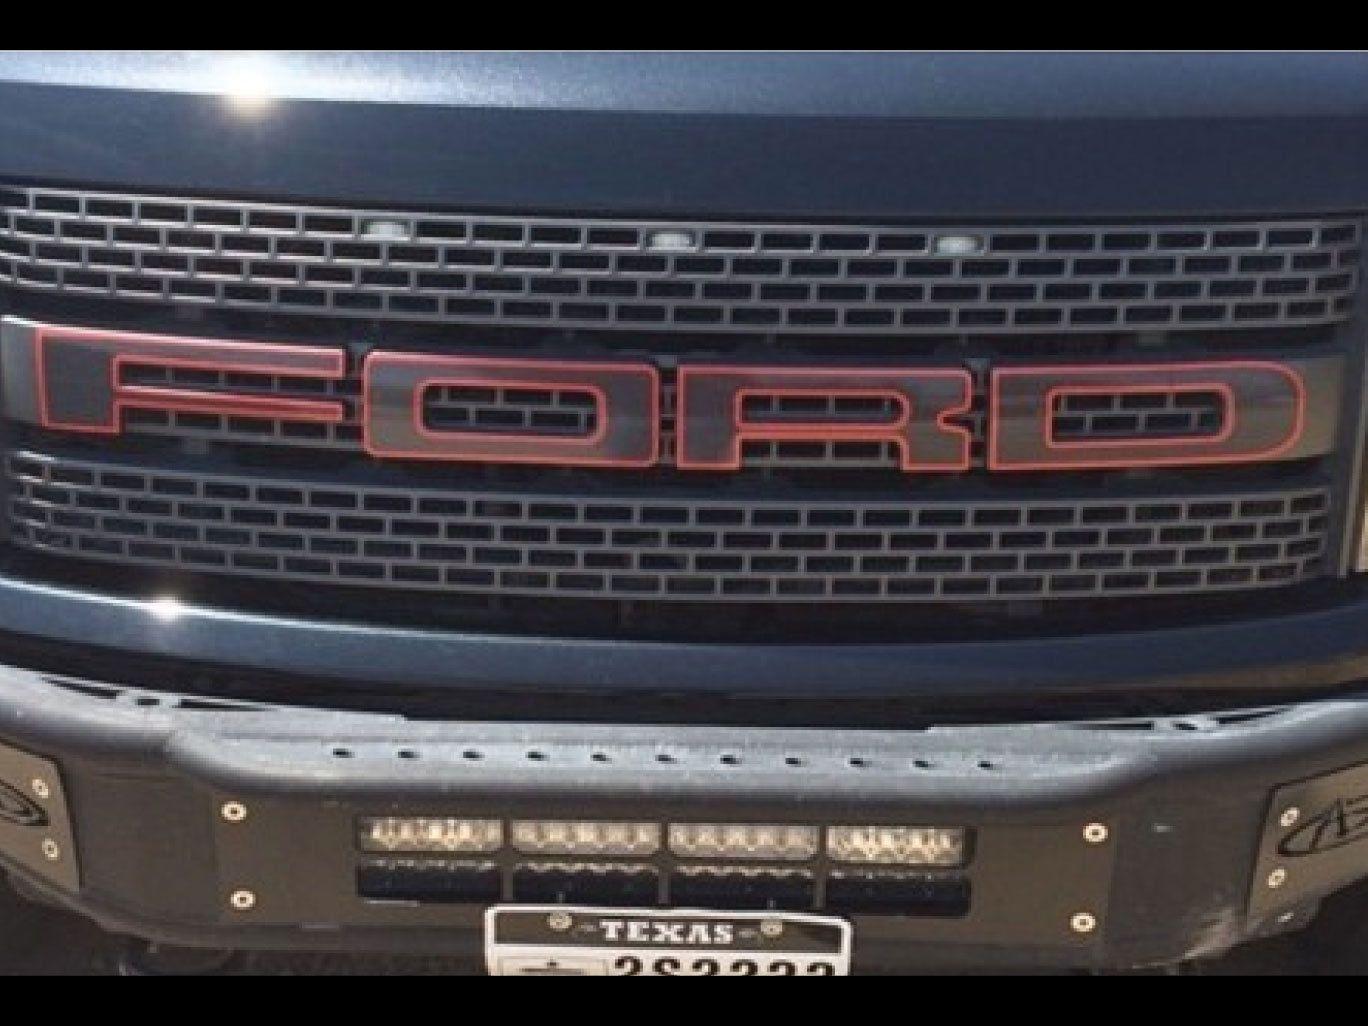 Details About Ford Raptor Svt F 150 Grille Letters W Outlines Stickers Vinyl Decals 2014 Ford Raptor Ford F150 Raptor Ford Rapter